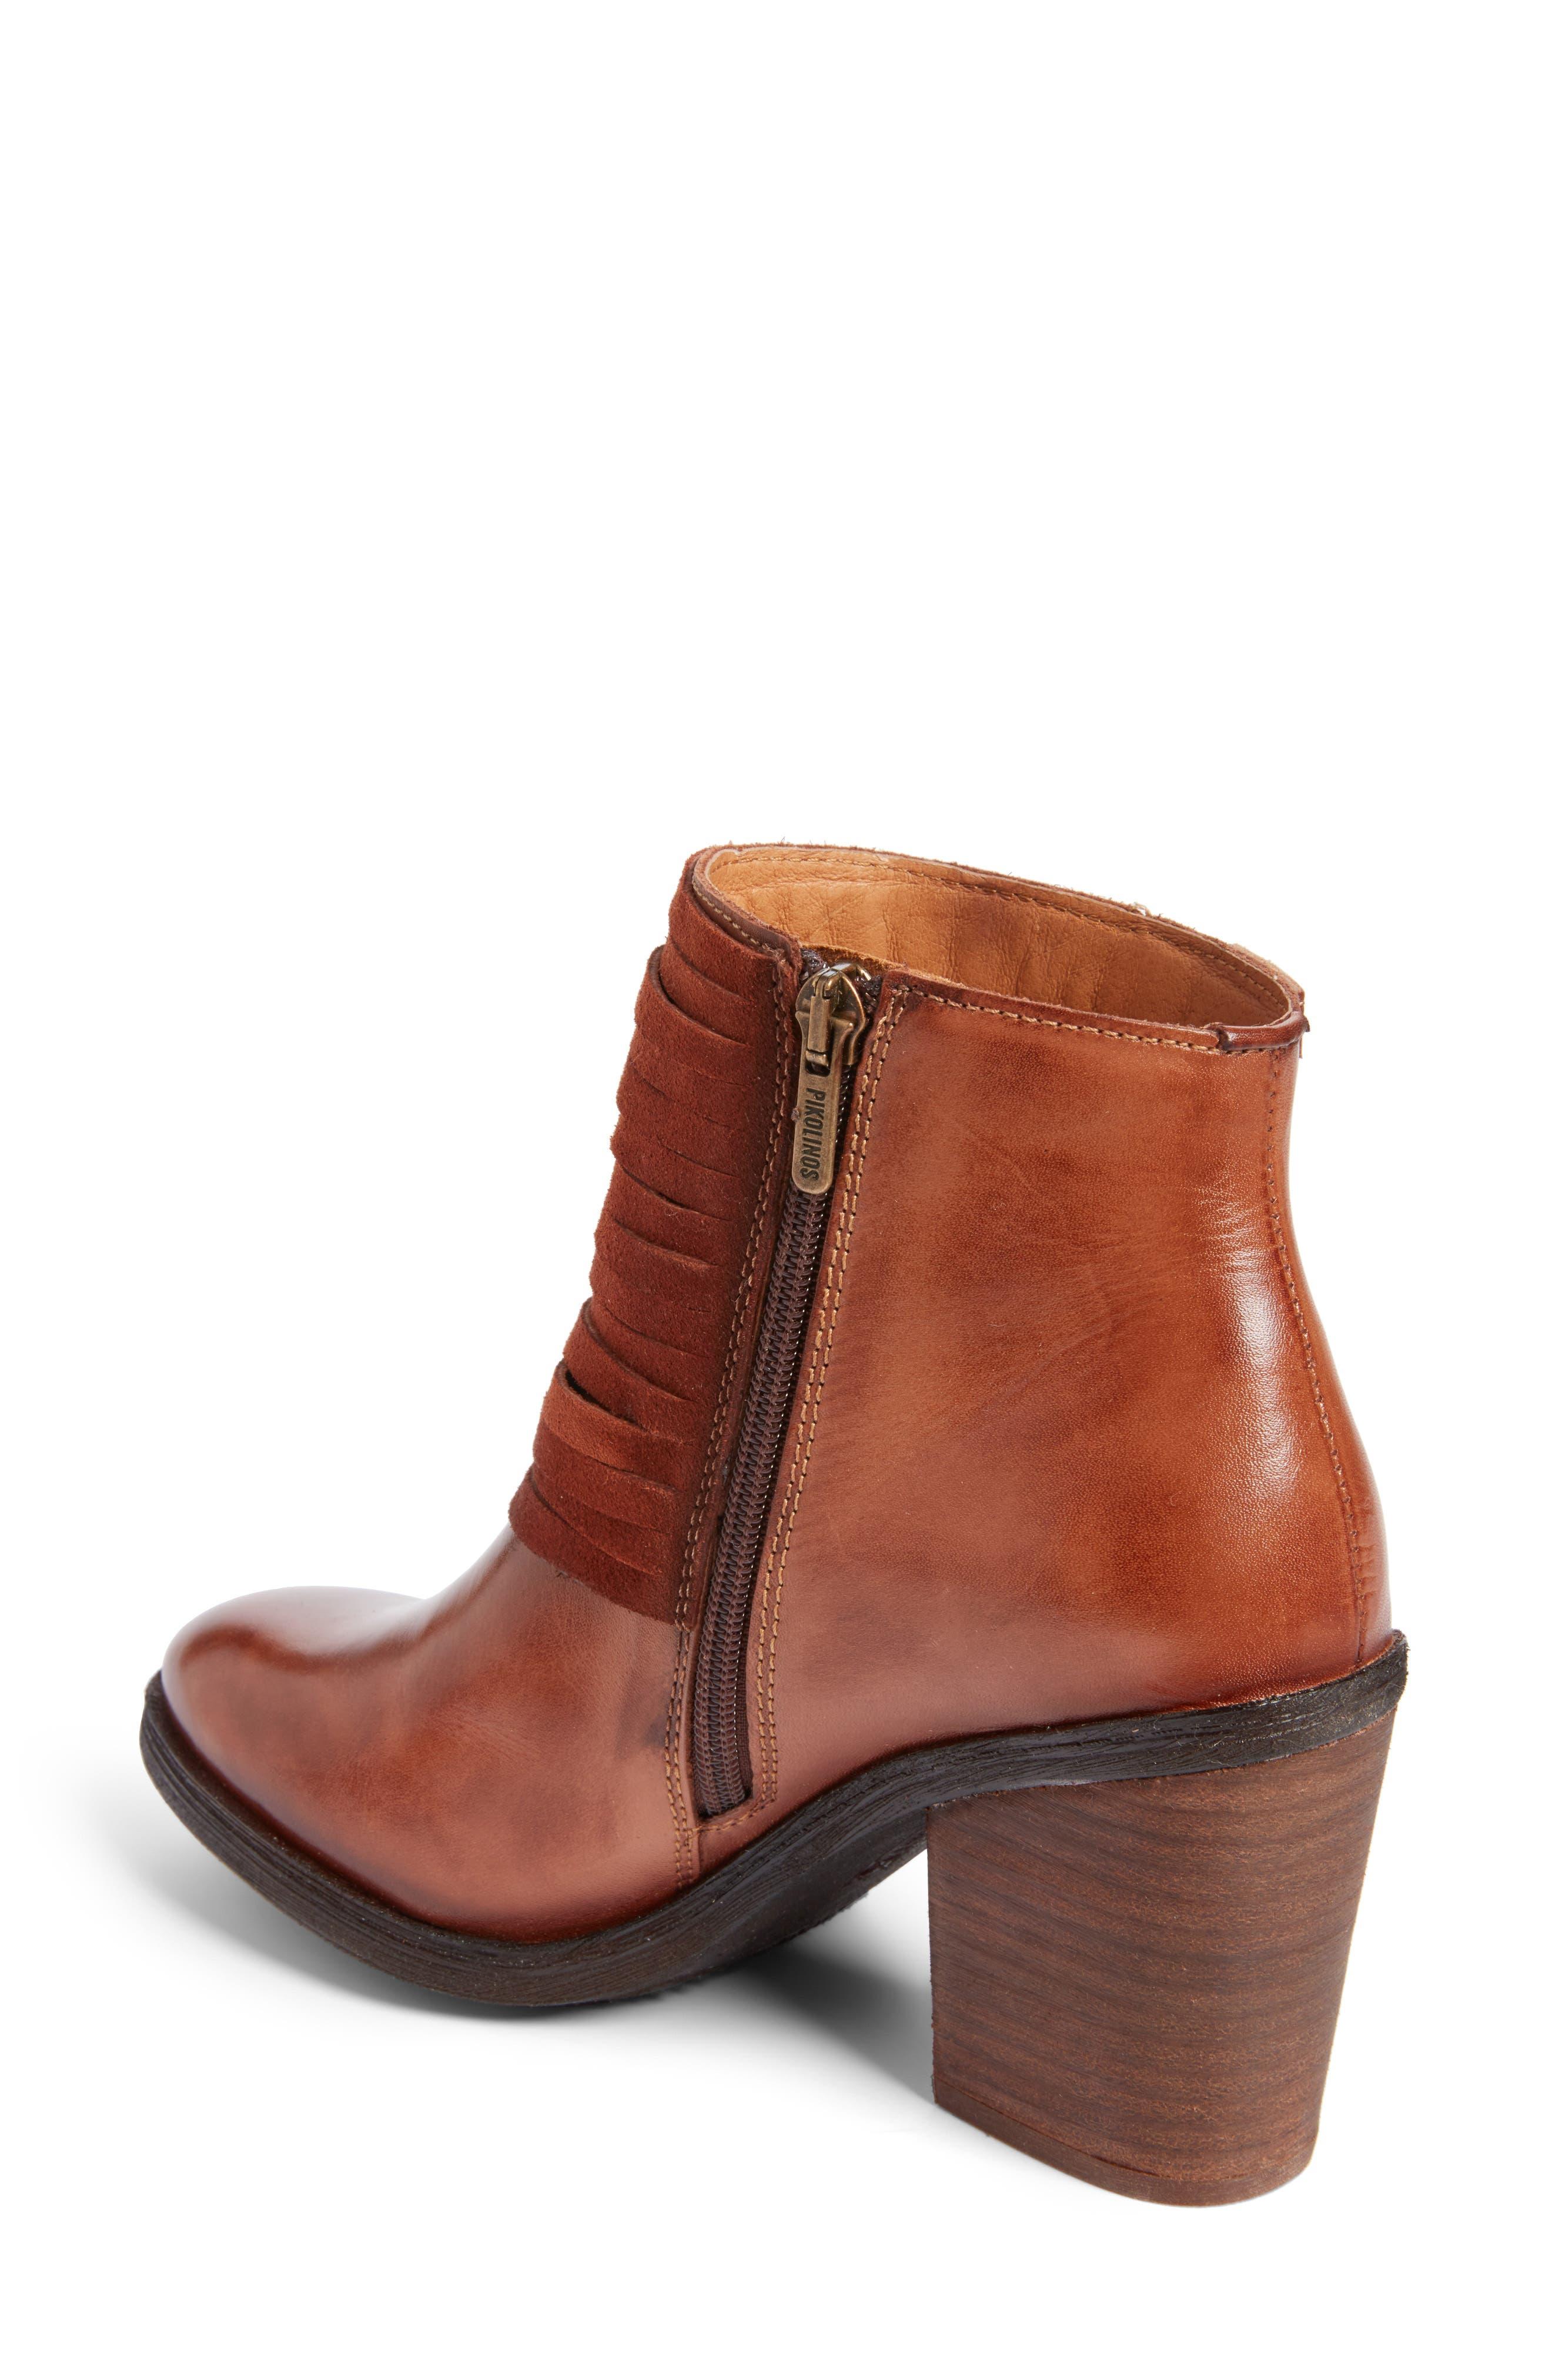 Alicante Bootie,                             Alternate thumbnail 2, color,                             Cuero Leather